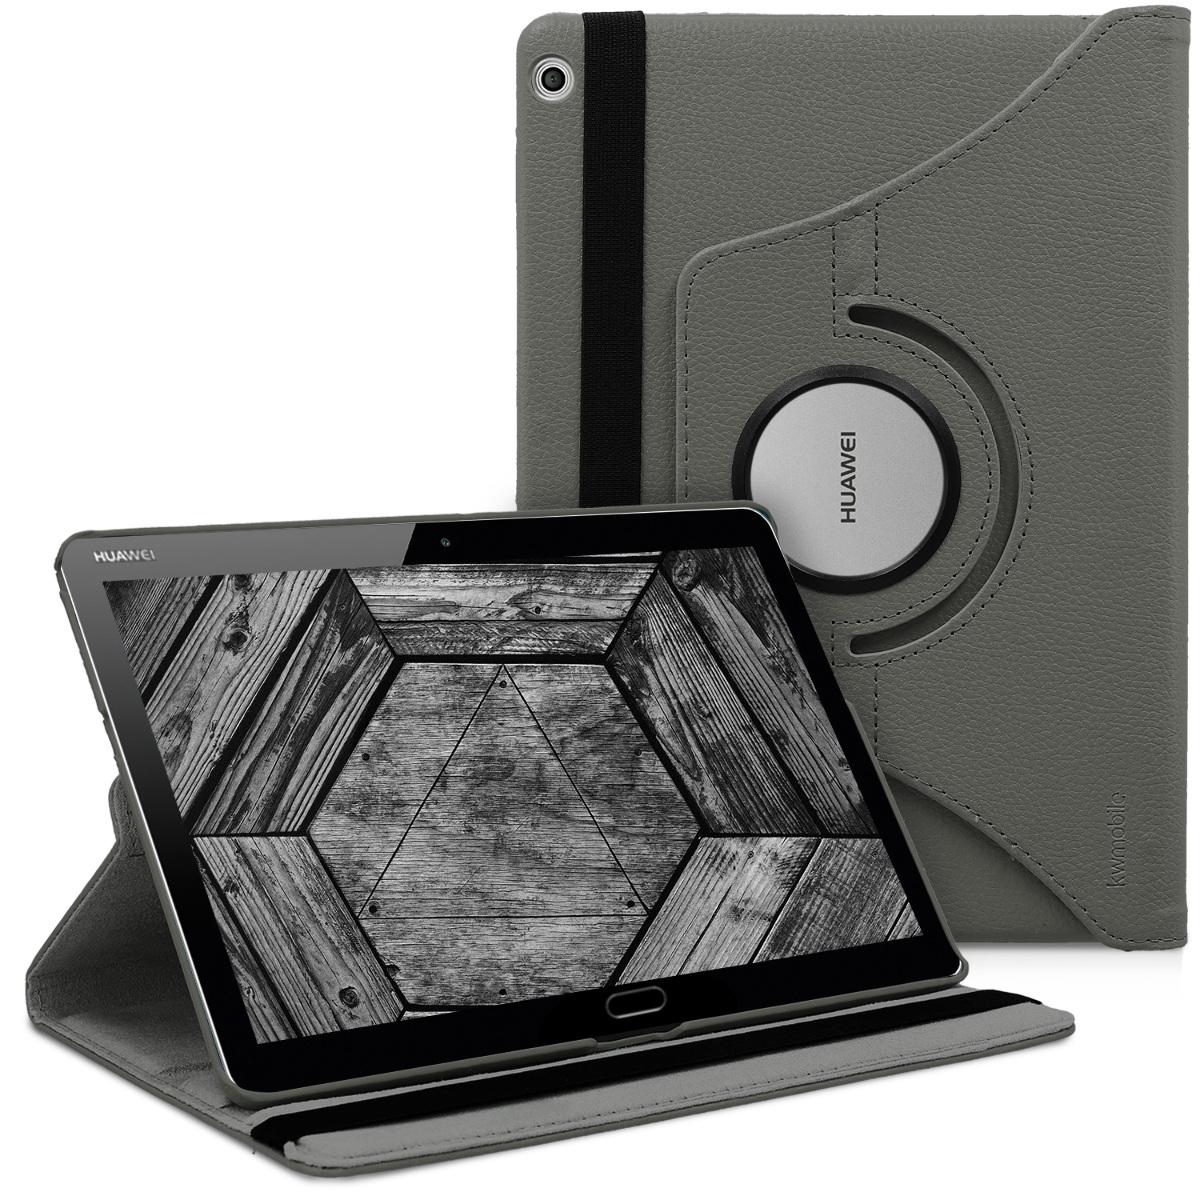 KW Θήκη 360°  Huawei MediaPad M3 Lite 10 -Συνθετικό Δέρμα - Grey (41998.22)